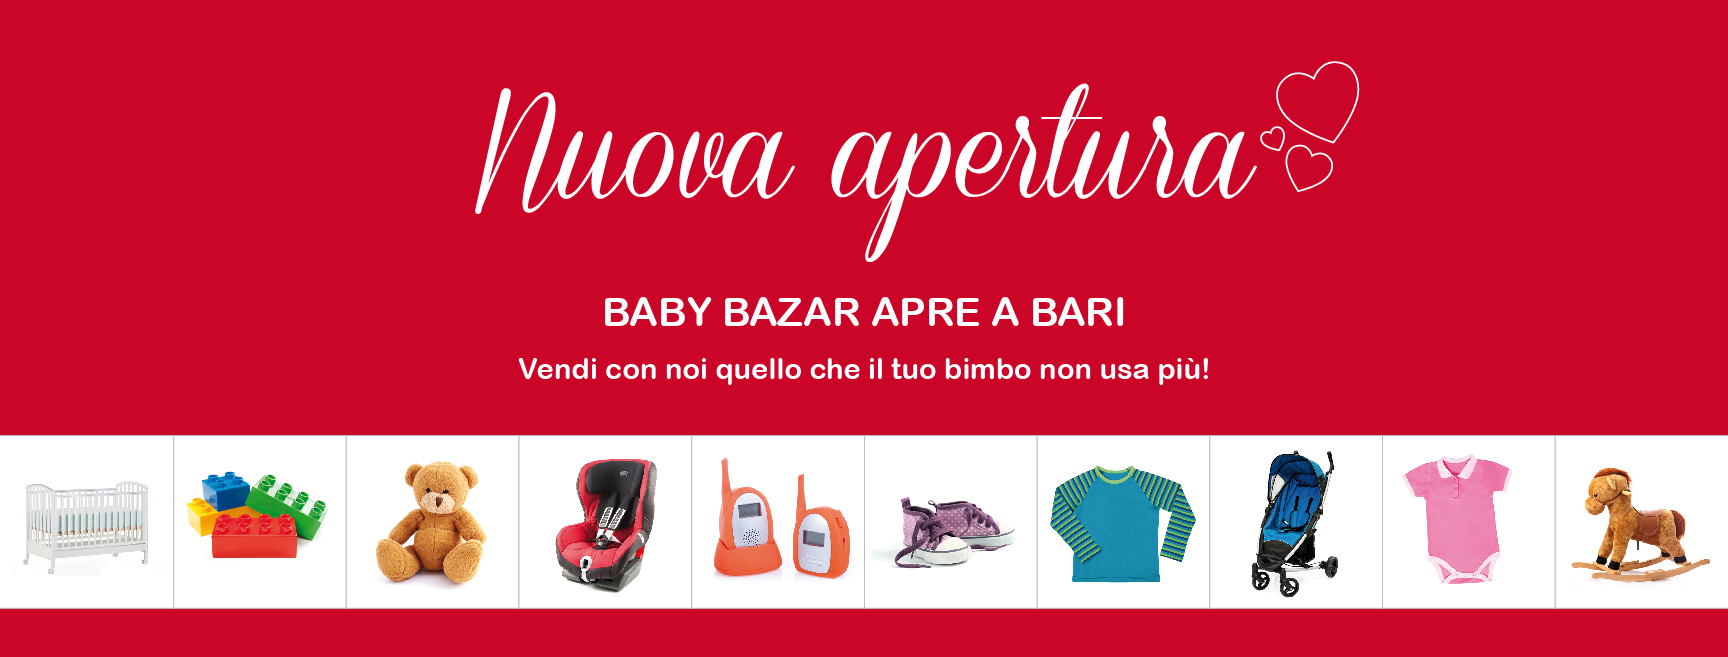 baby bazar bari